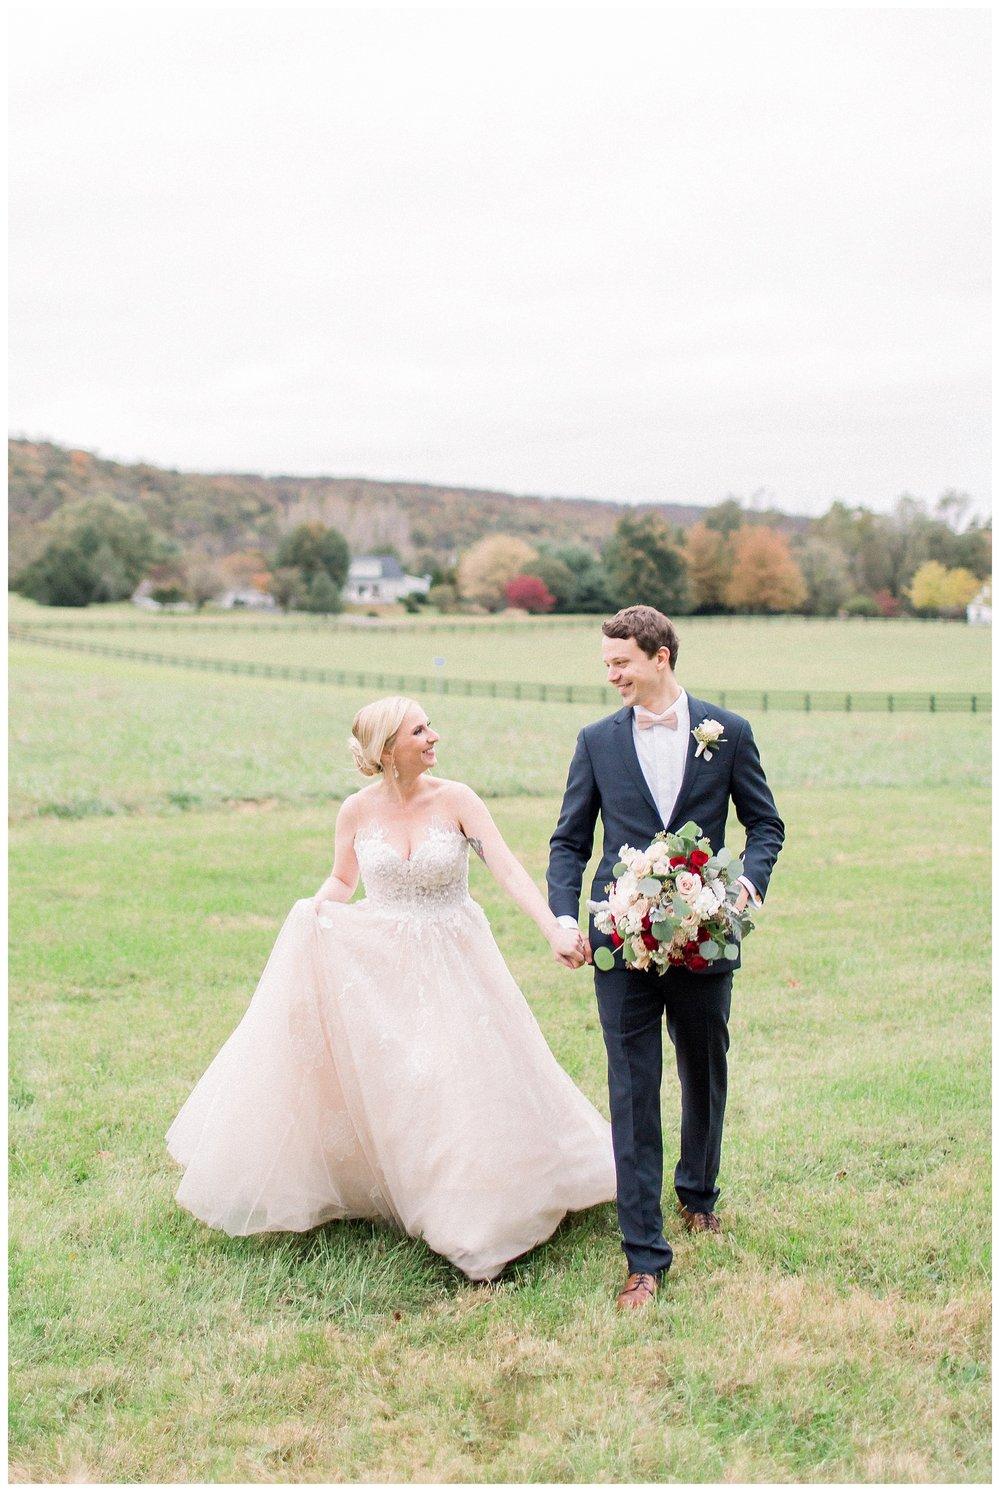 Whitehall Estate Wedding | Northern Virginia Wedding Photographer Kir Tuben_0098.jpg